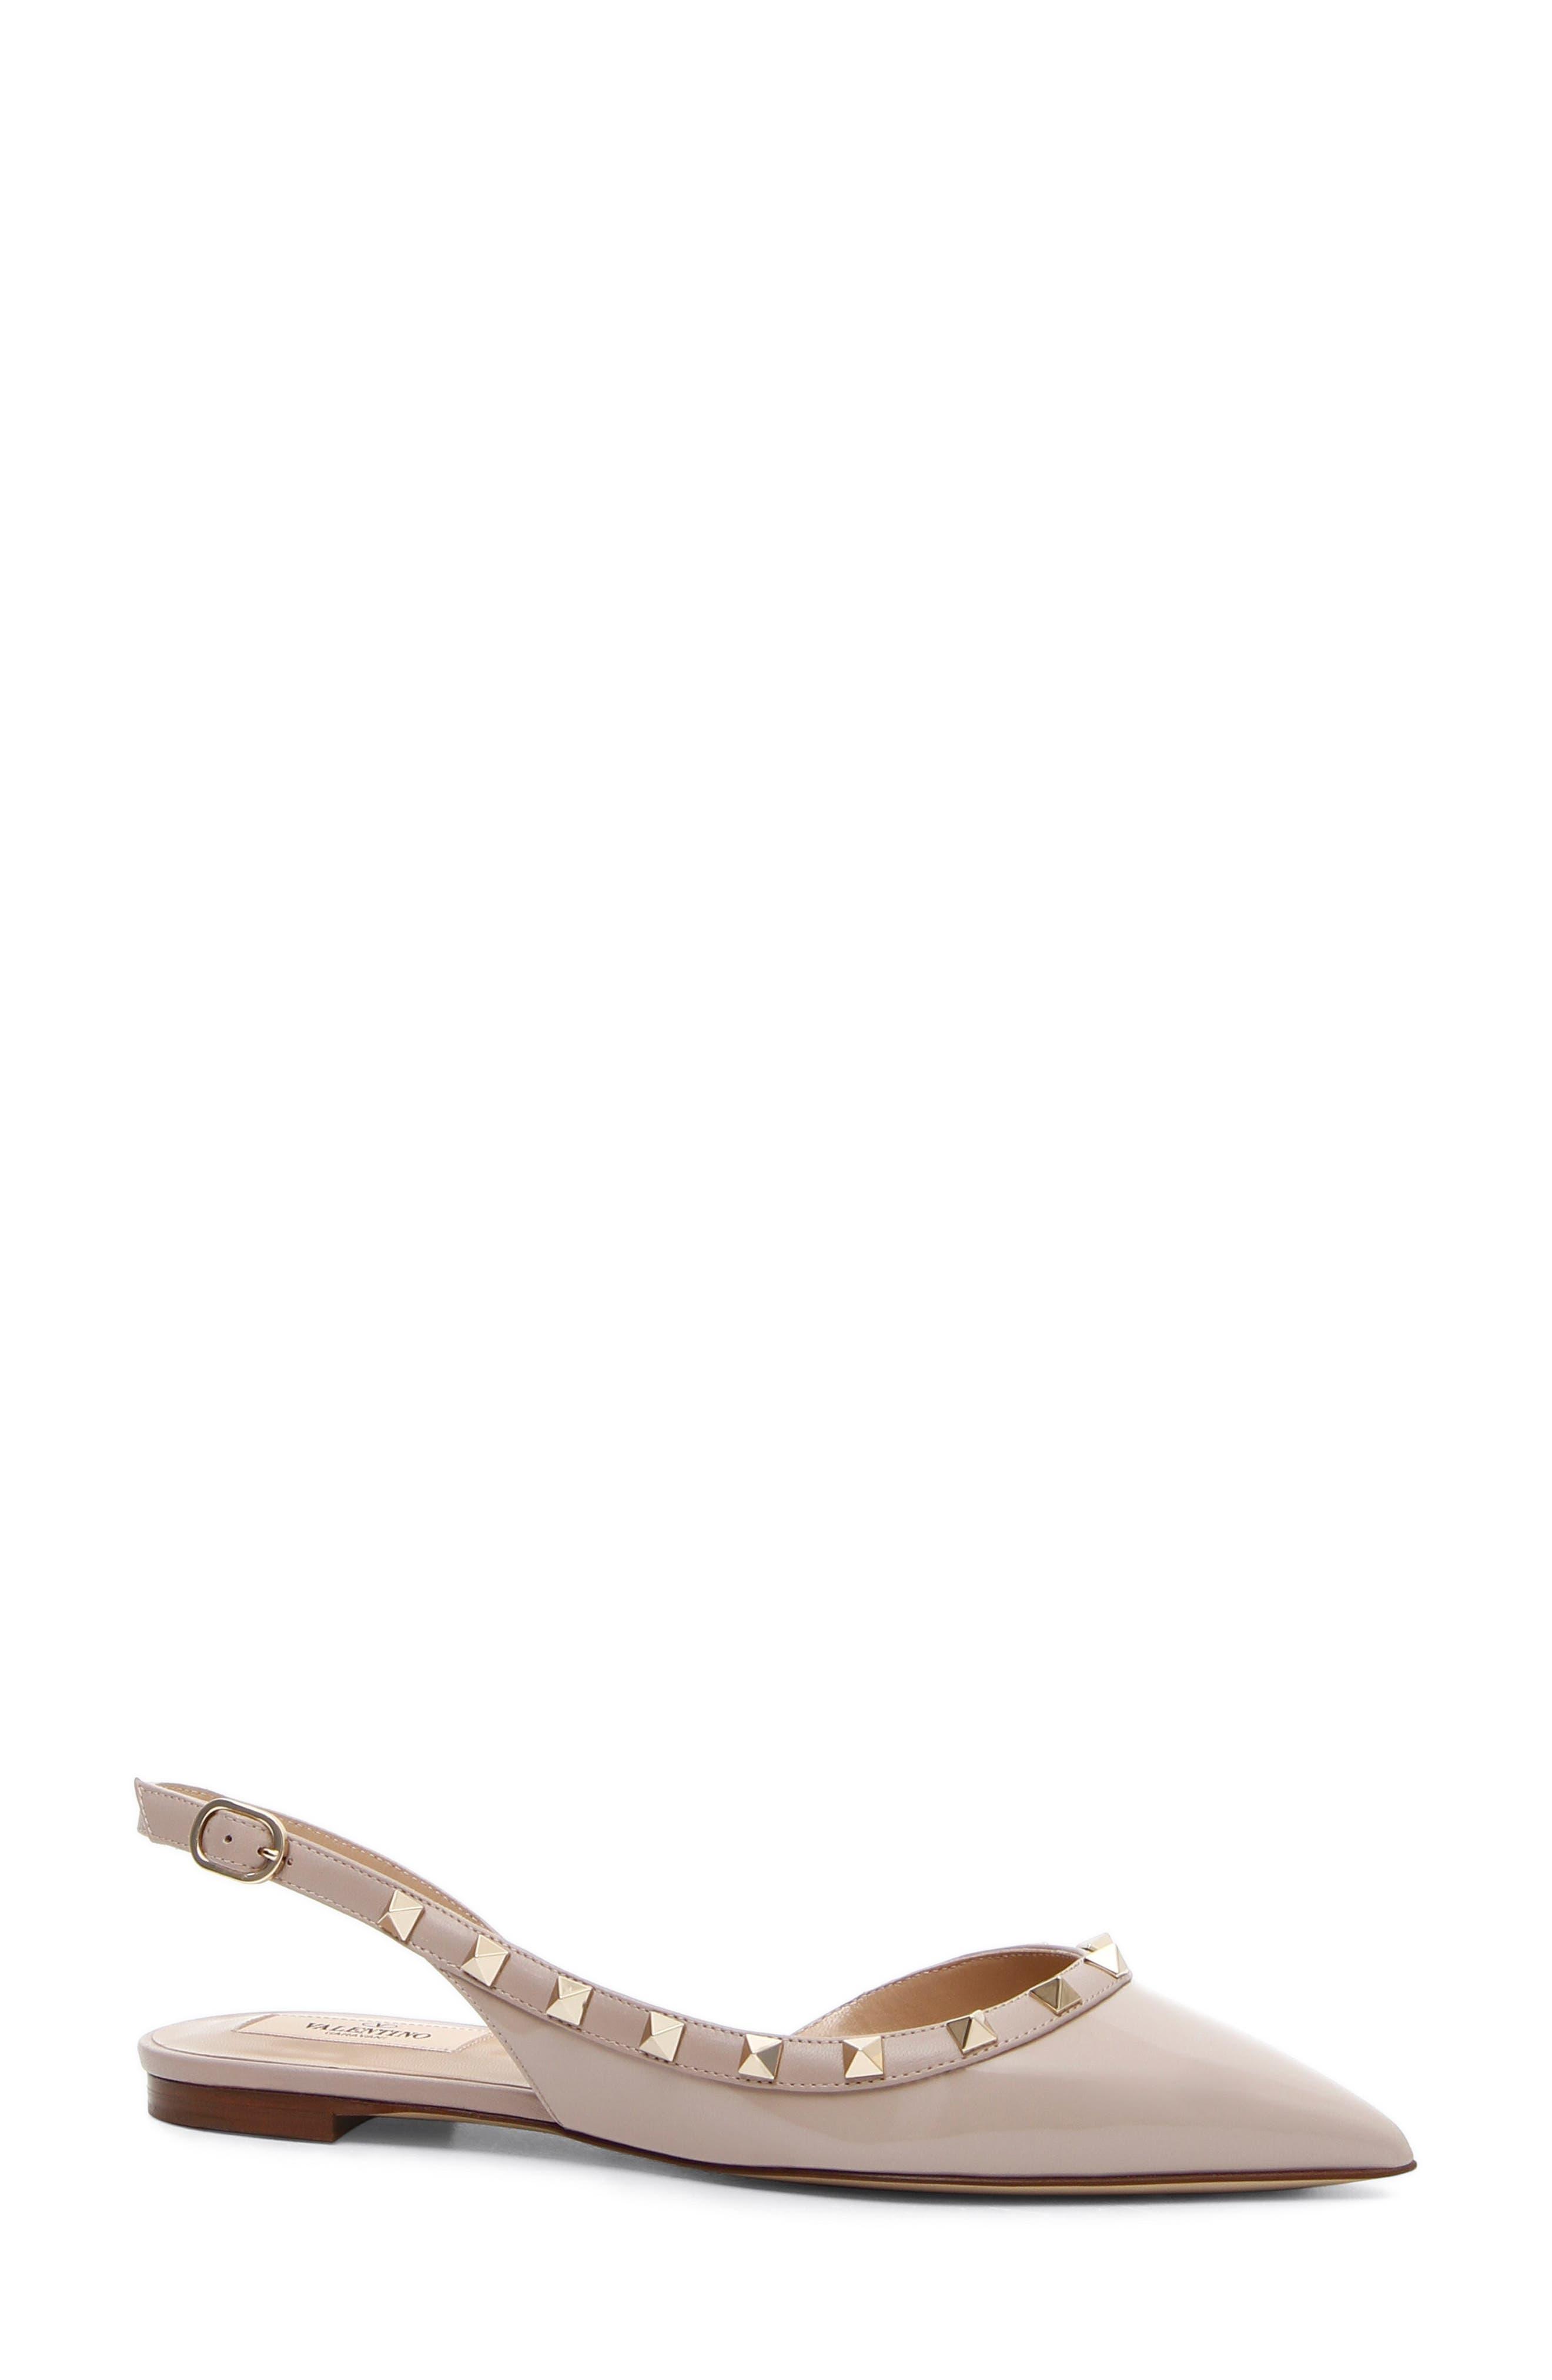 VALENTINO GARAVANI Rockstud Slingback Ballerina Flat, Main, color, POUDRE LEATHER